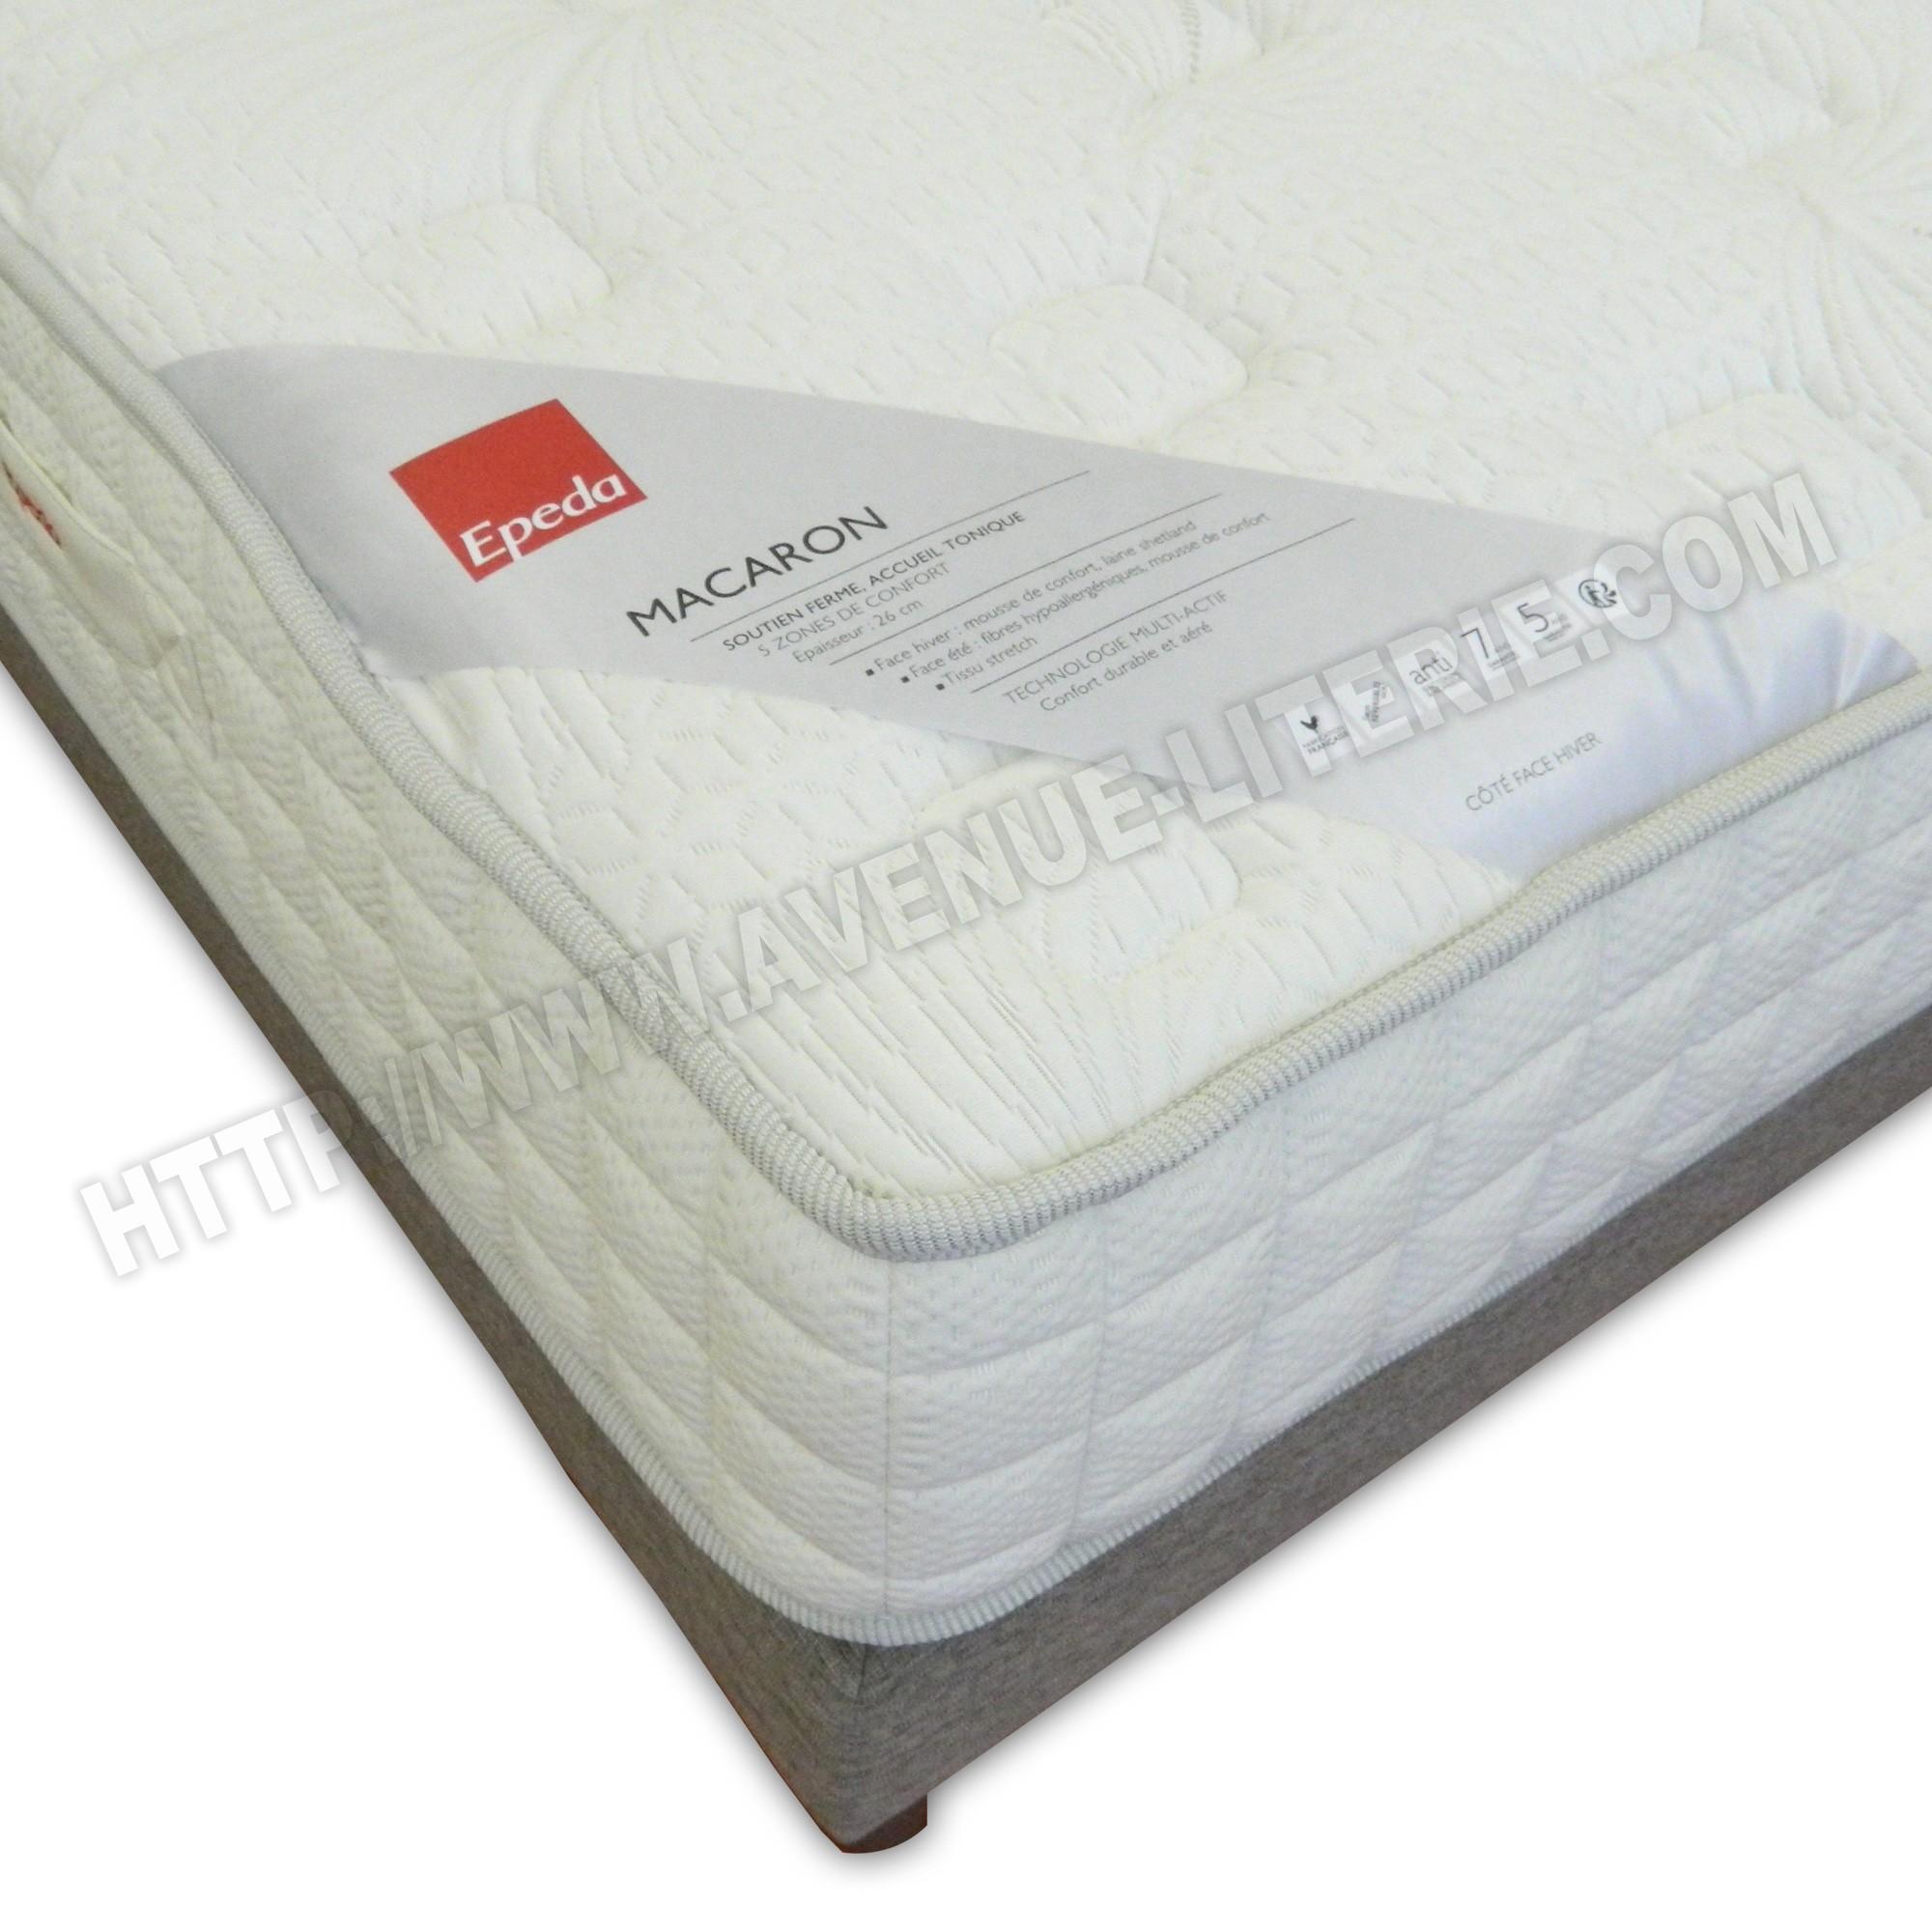 ensemble literie 140x190 macaron epeda matelas sommier chin gris de epeda. Black Bedroom Furniture Sets. Home Design Ideas